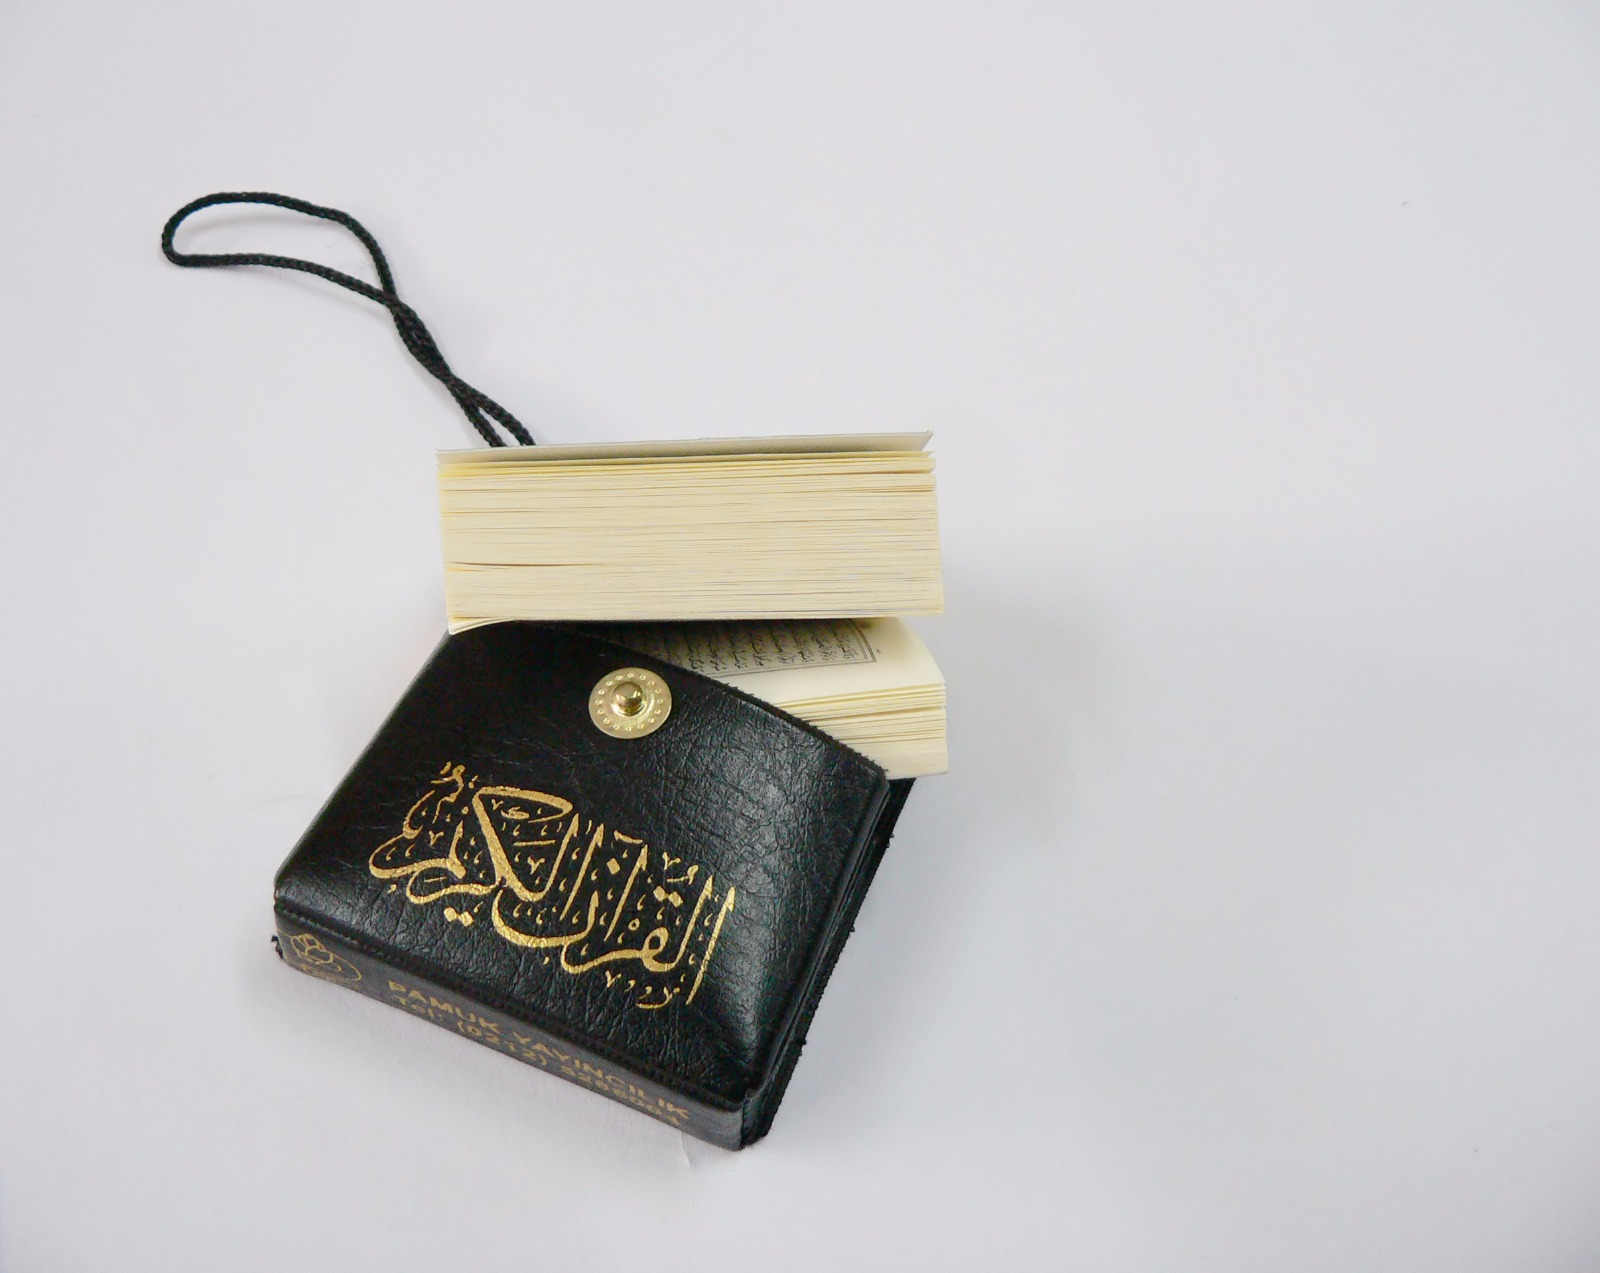 Photo of Ringkasan Tafsir Surah Al-Lahab (Surah 111)